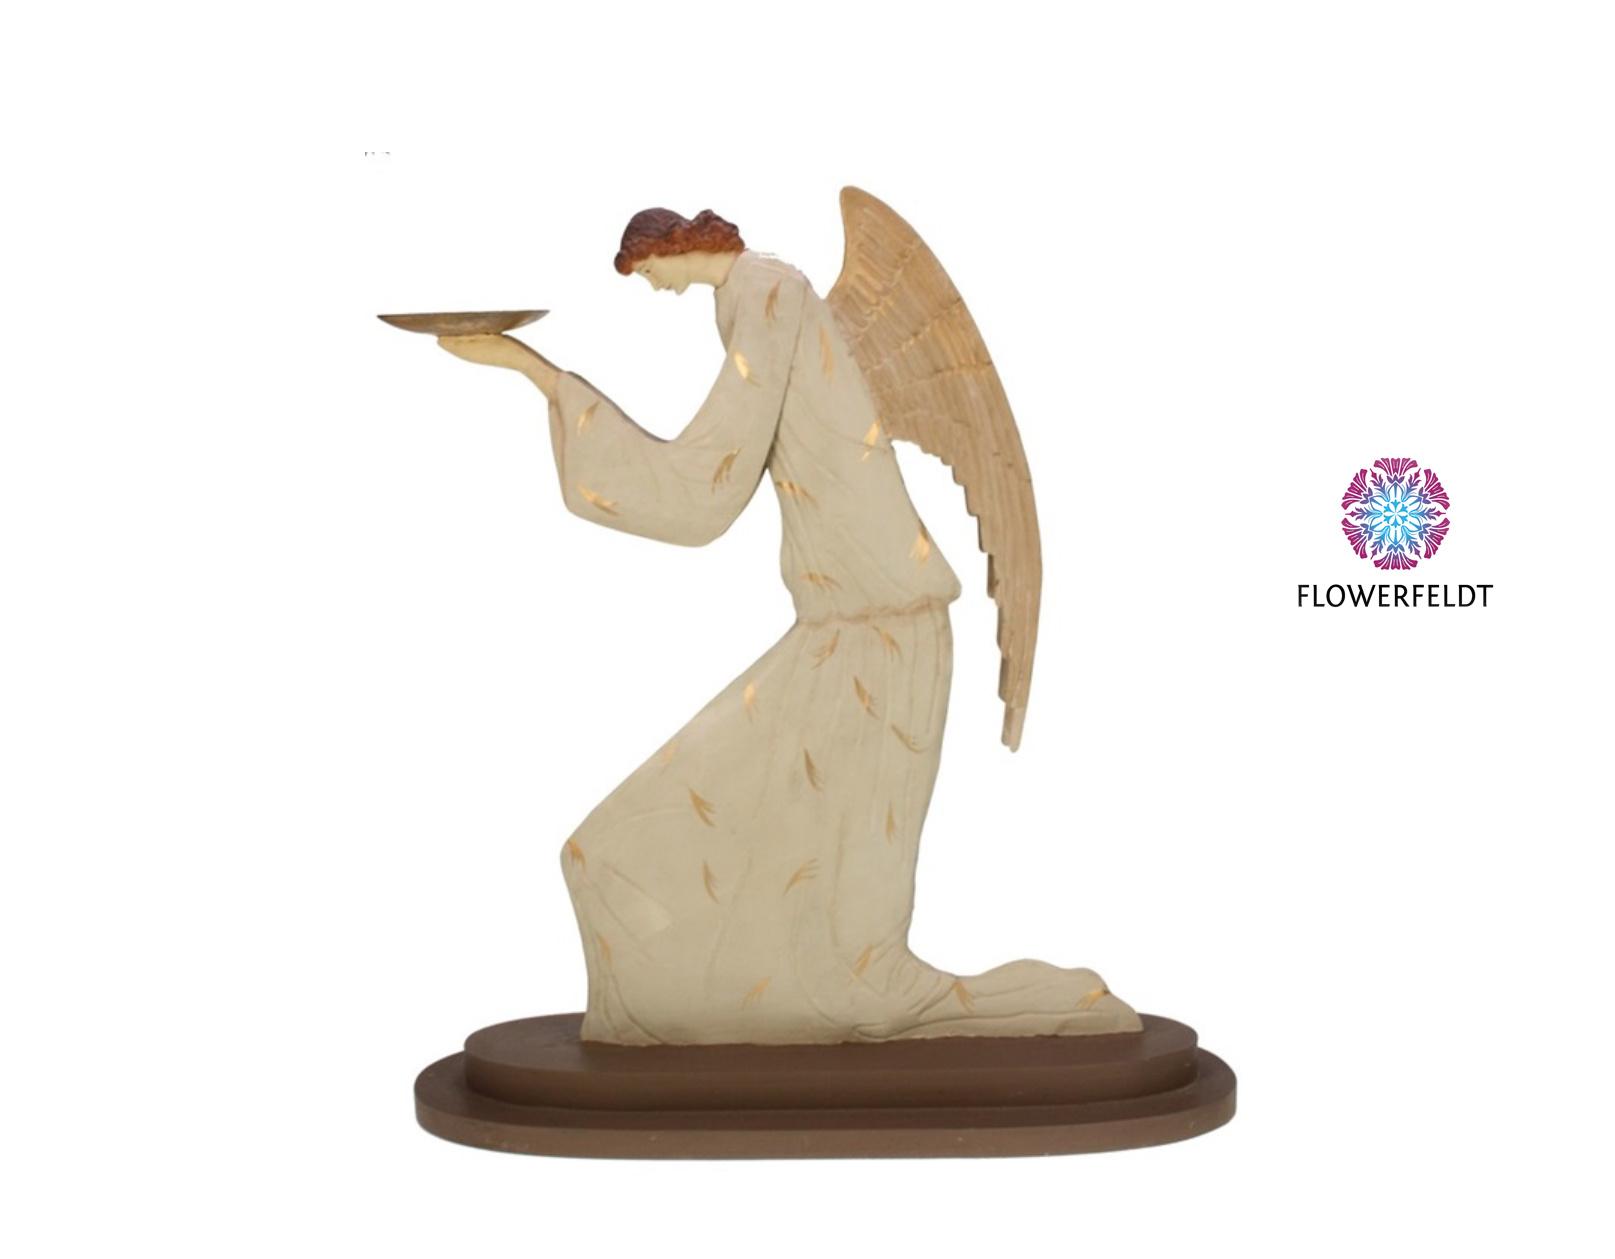 Engel met schaal knielend - H54,5 cm